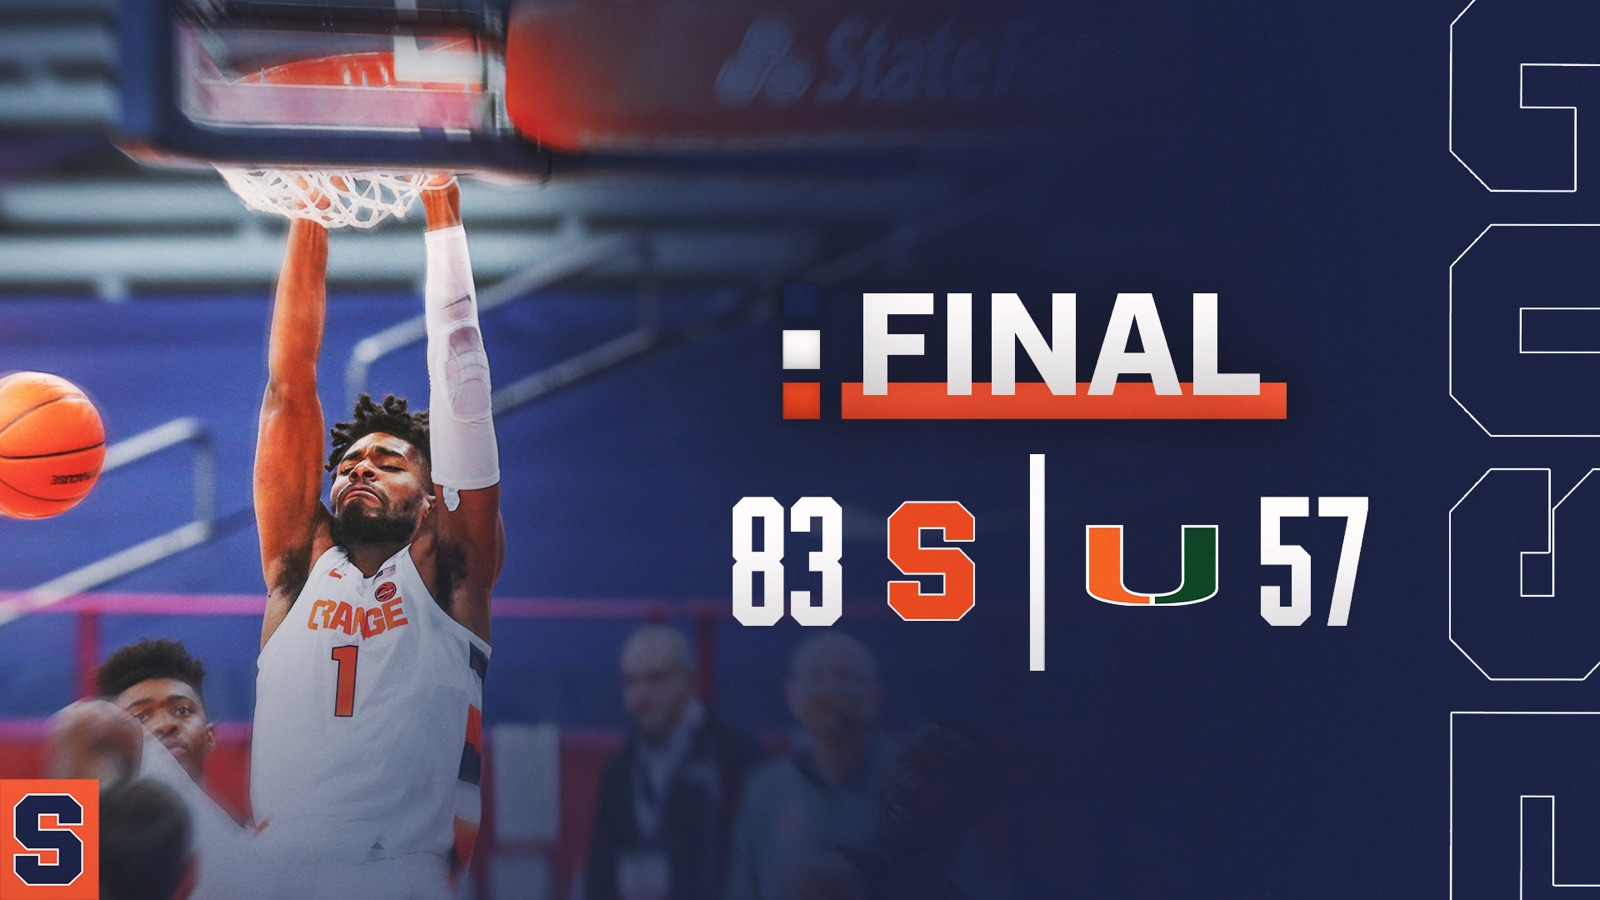 ORANGE GAME DAY: Syracuse hosts Miami tonight (preview, media & info)